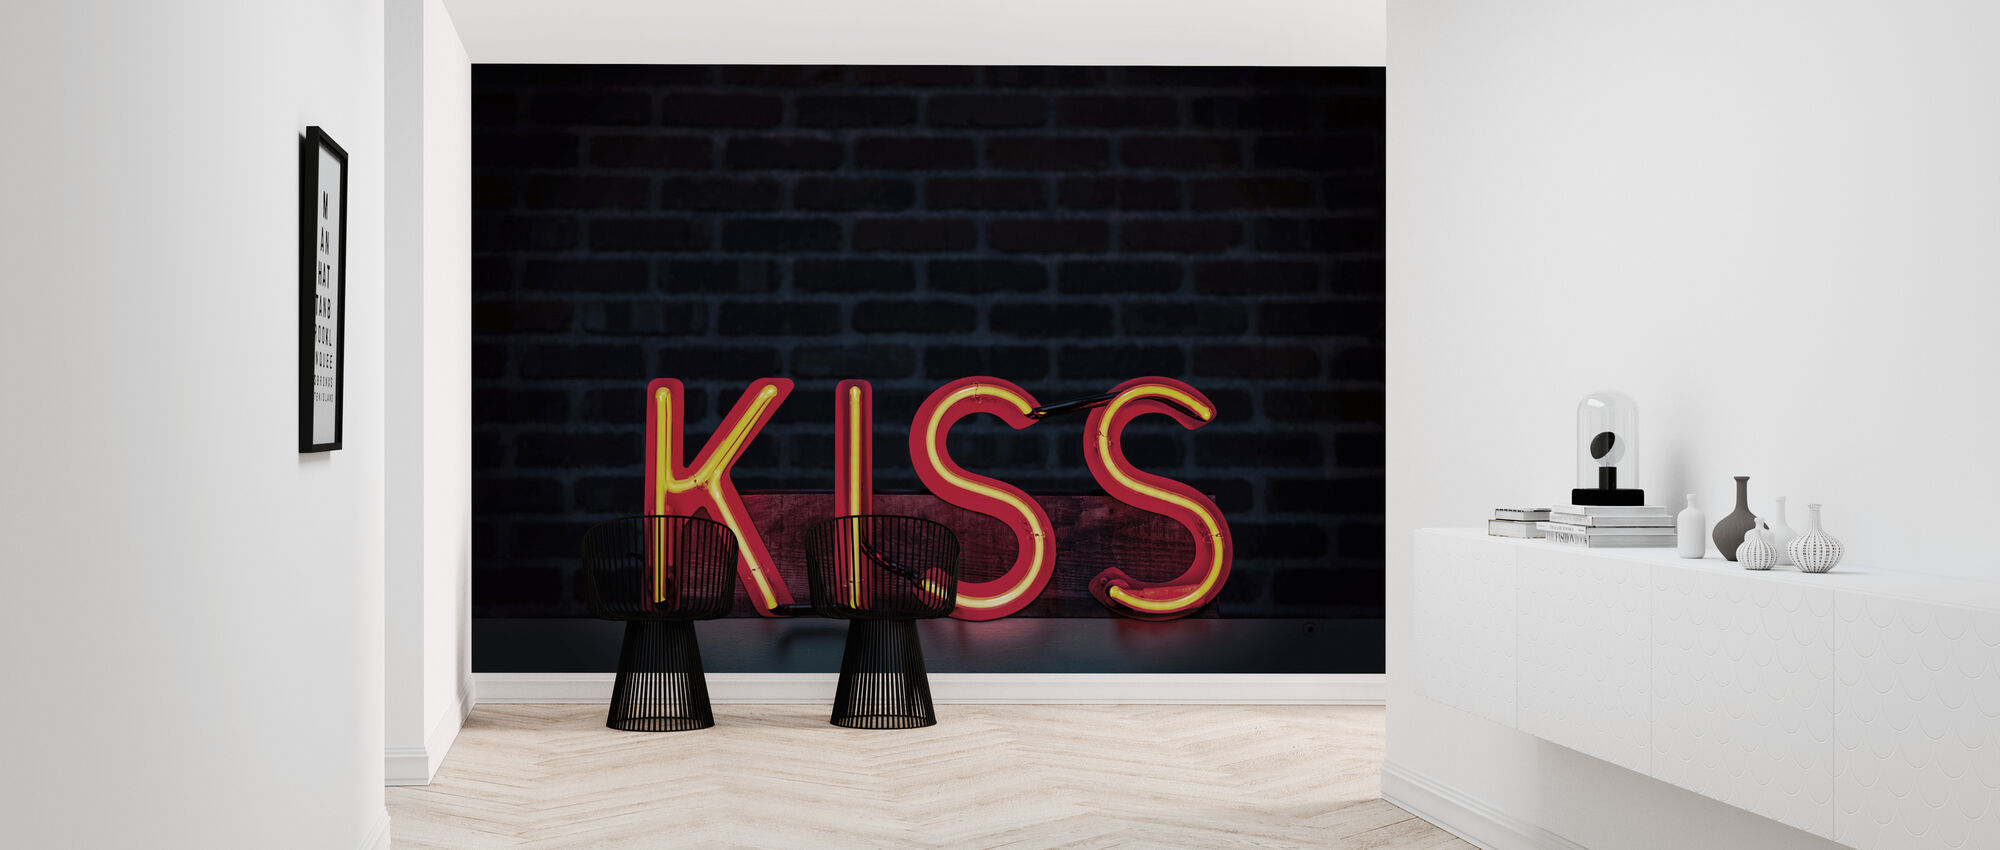 Kiss Neon Sign - Wallpaper - Hallway